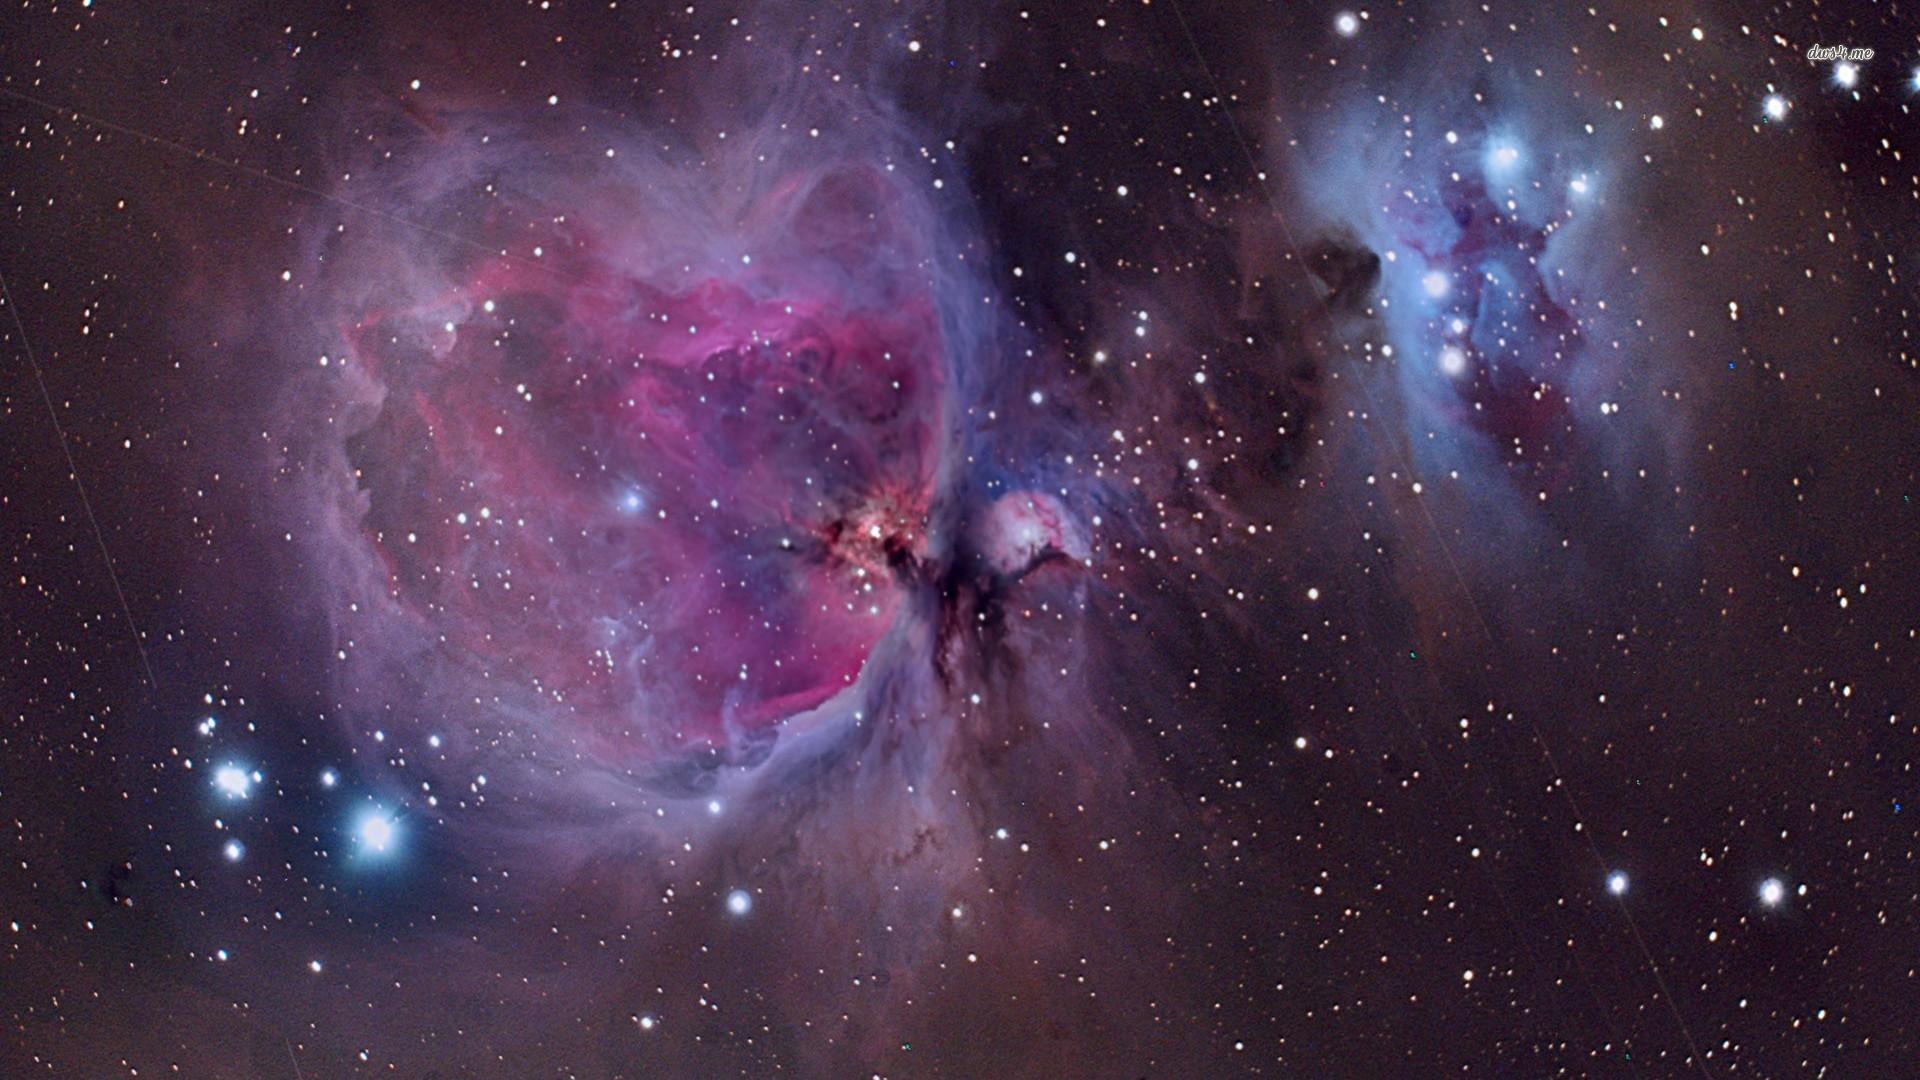 1920x1080, Px New Fhdq Images Of Orion Nebula Hd, Full - Orion Nebula Full Hd - HD Wallpaper